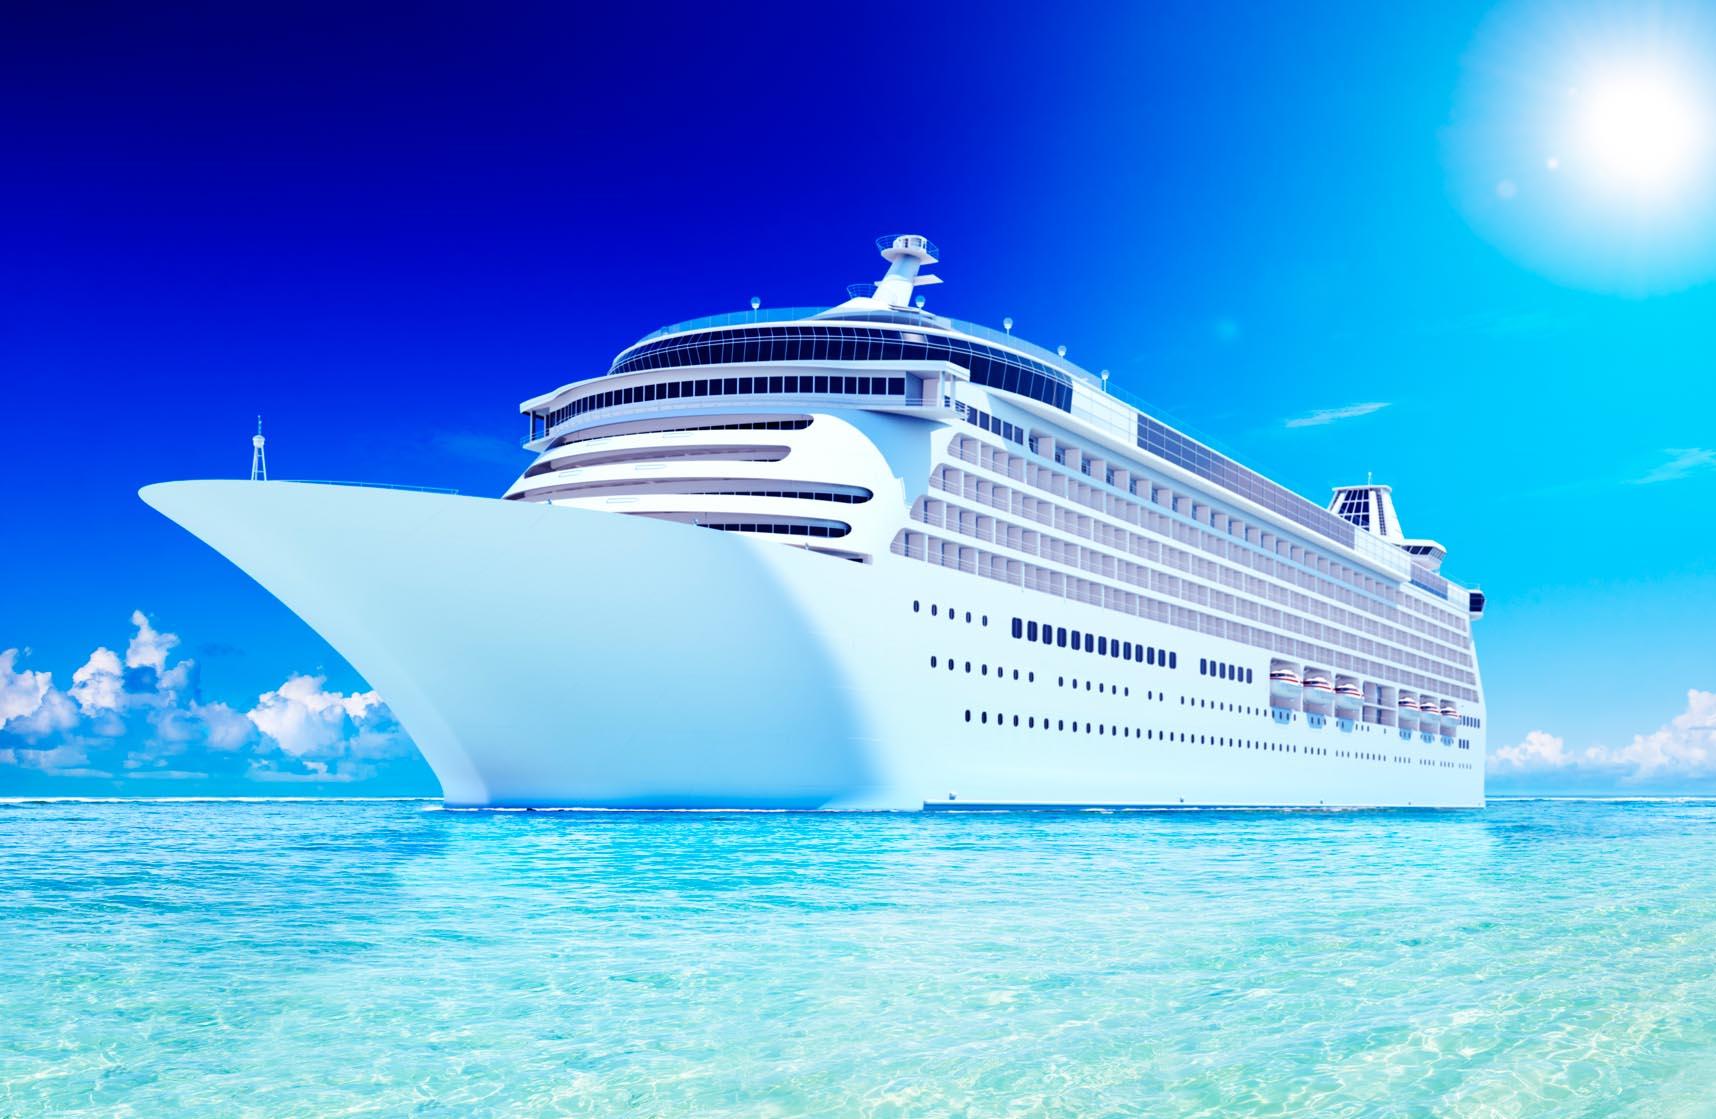 Cruise Line Stocks Sinking in Choppy Waters